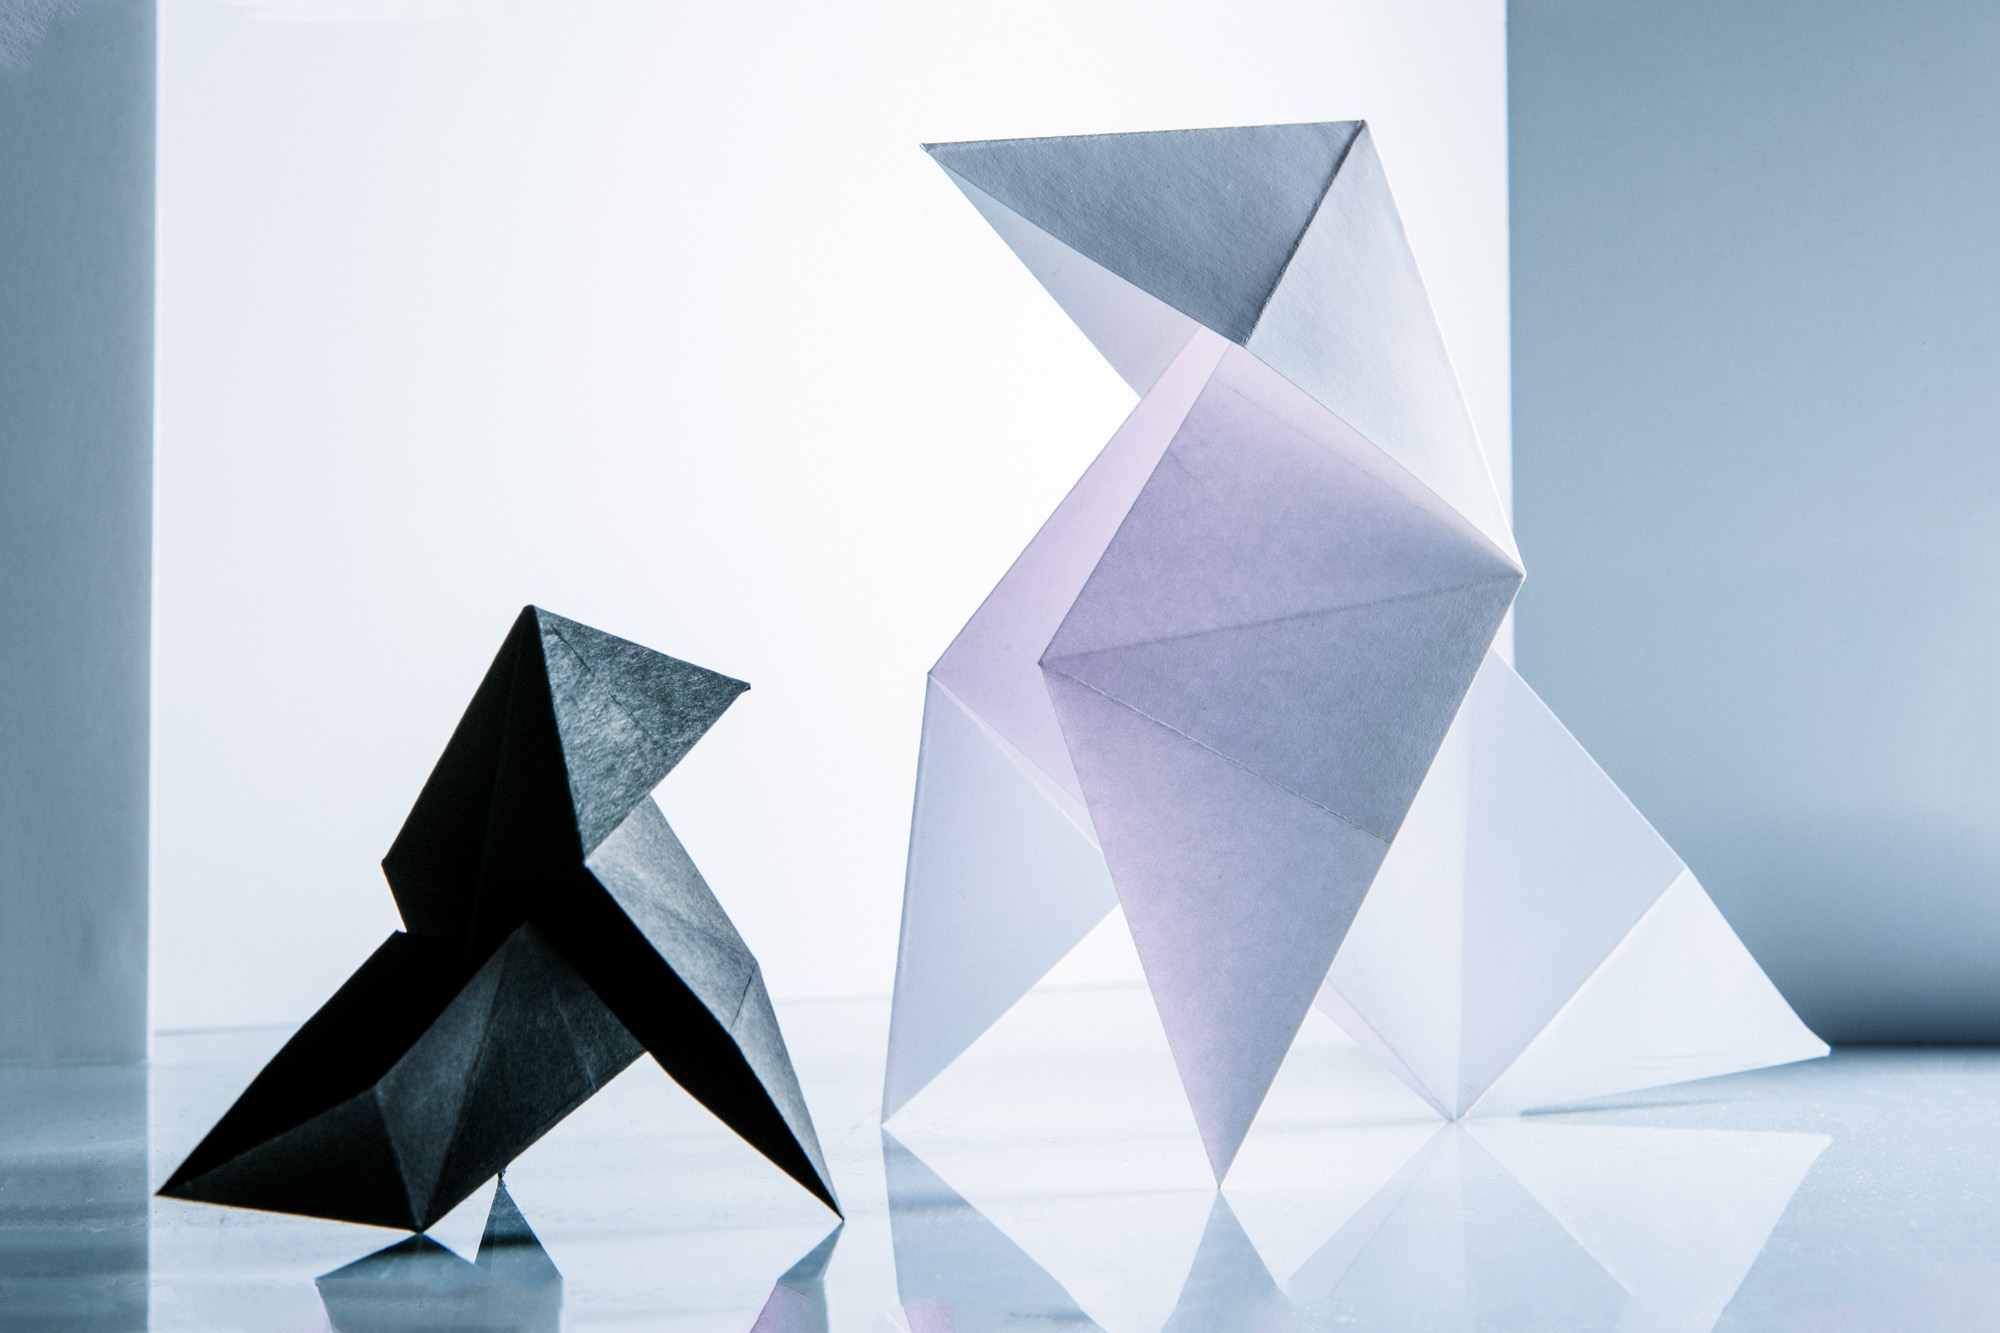 Origamis dans une ambiance glaciale